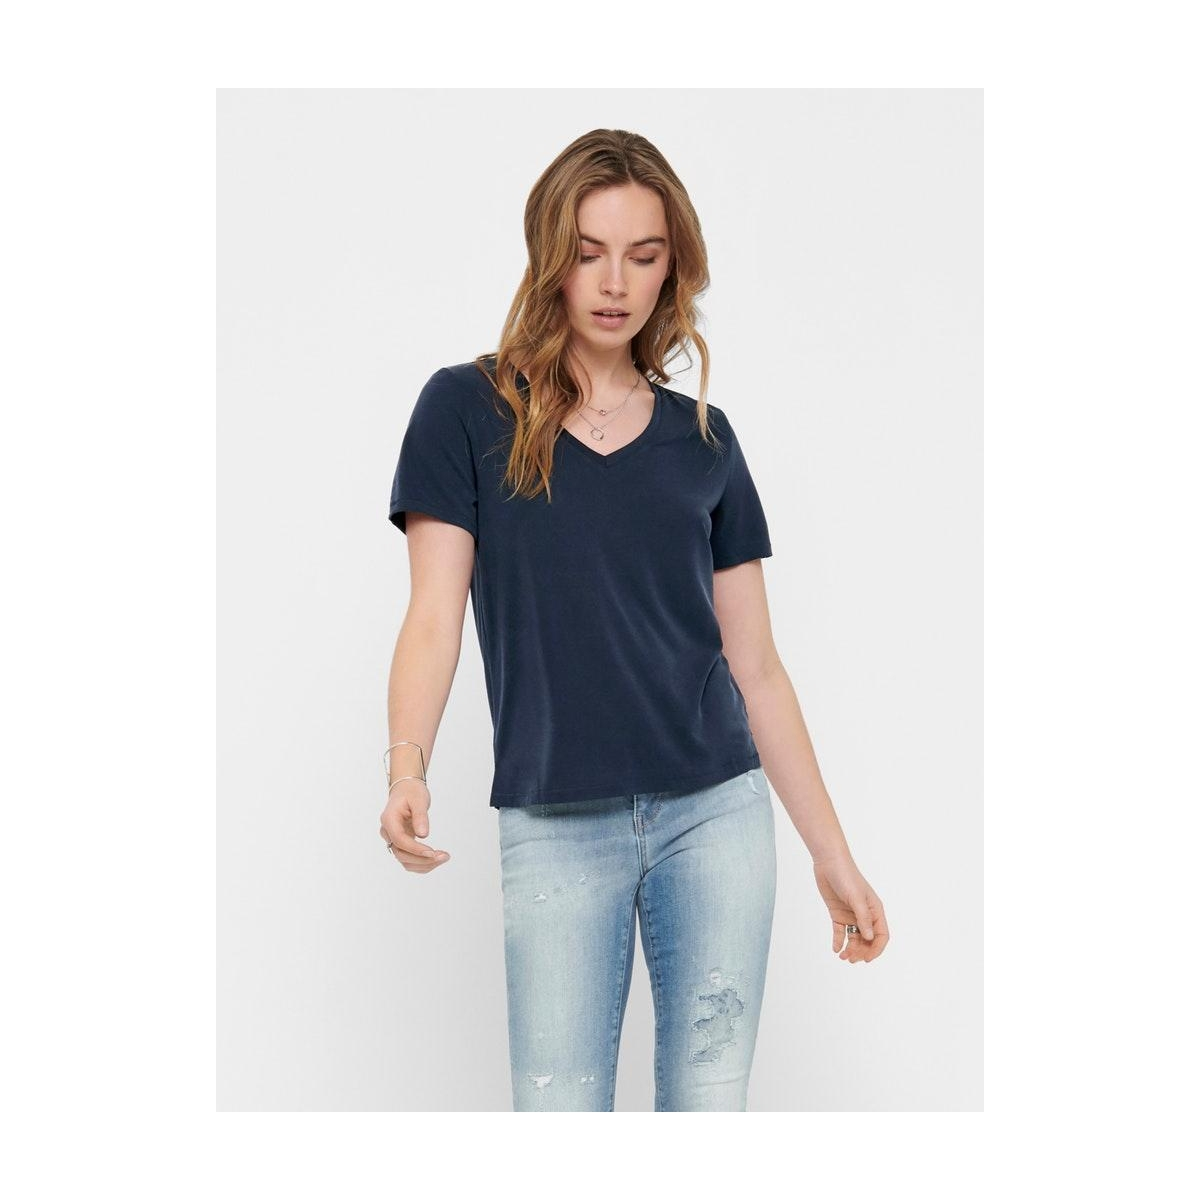 onlfree life s/s v-neck top noos jr 15199572 only t-shirt night sky